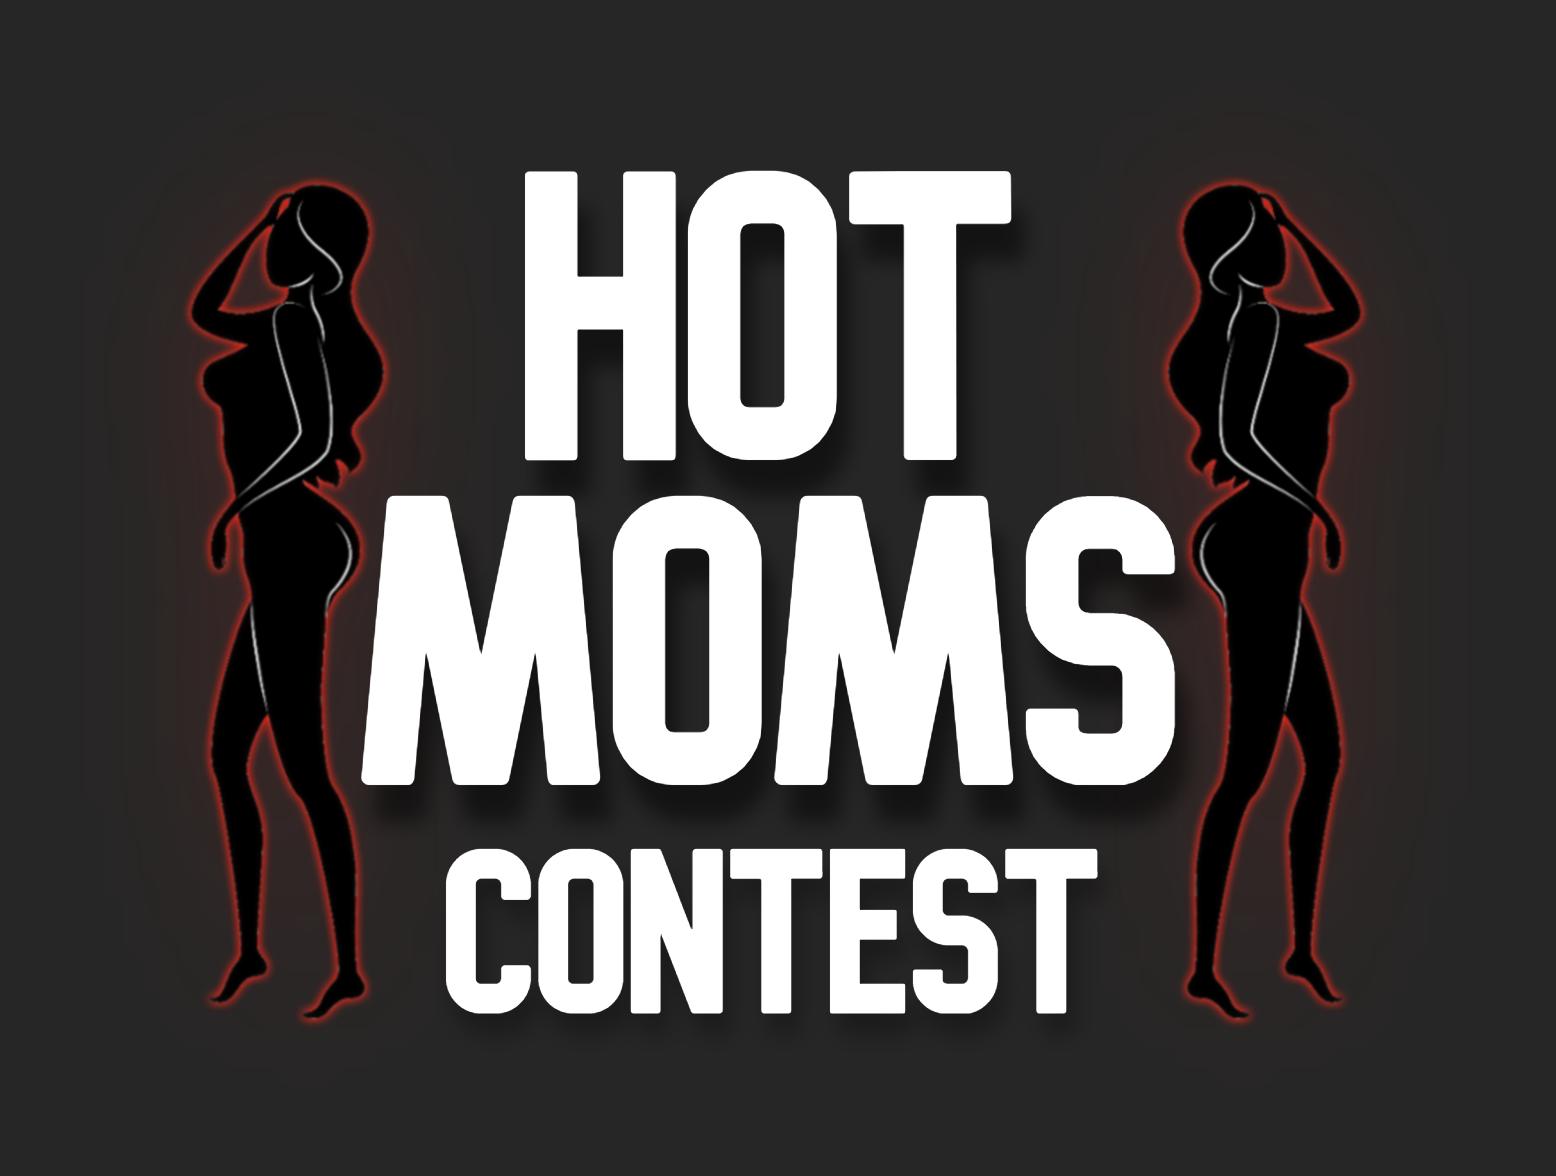 Hot Mooms